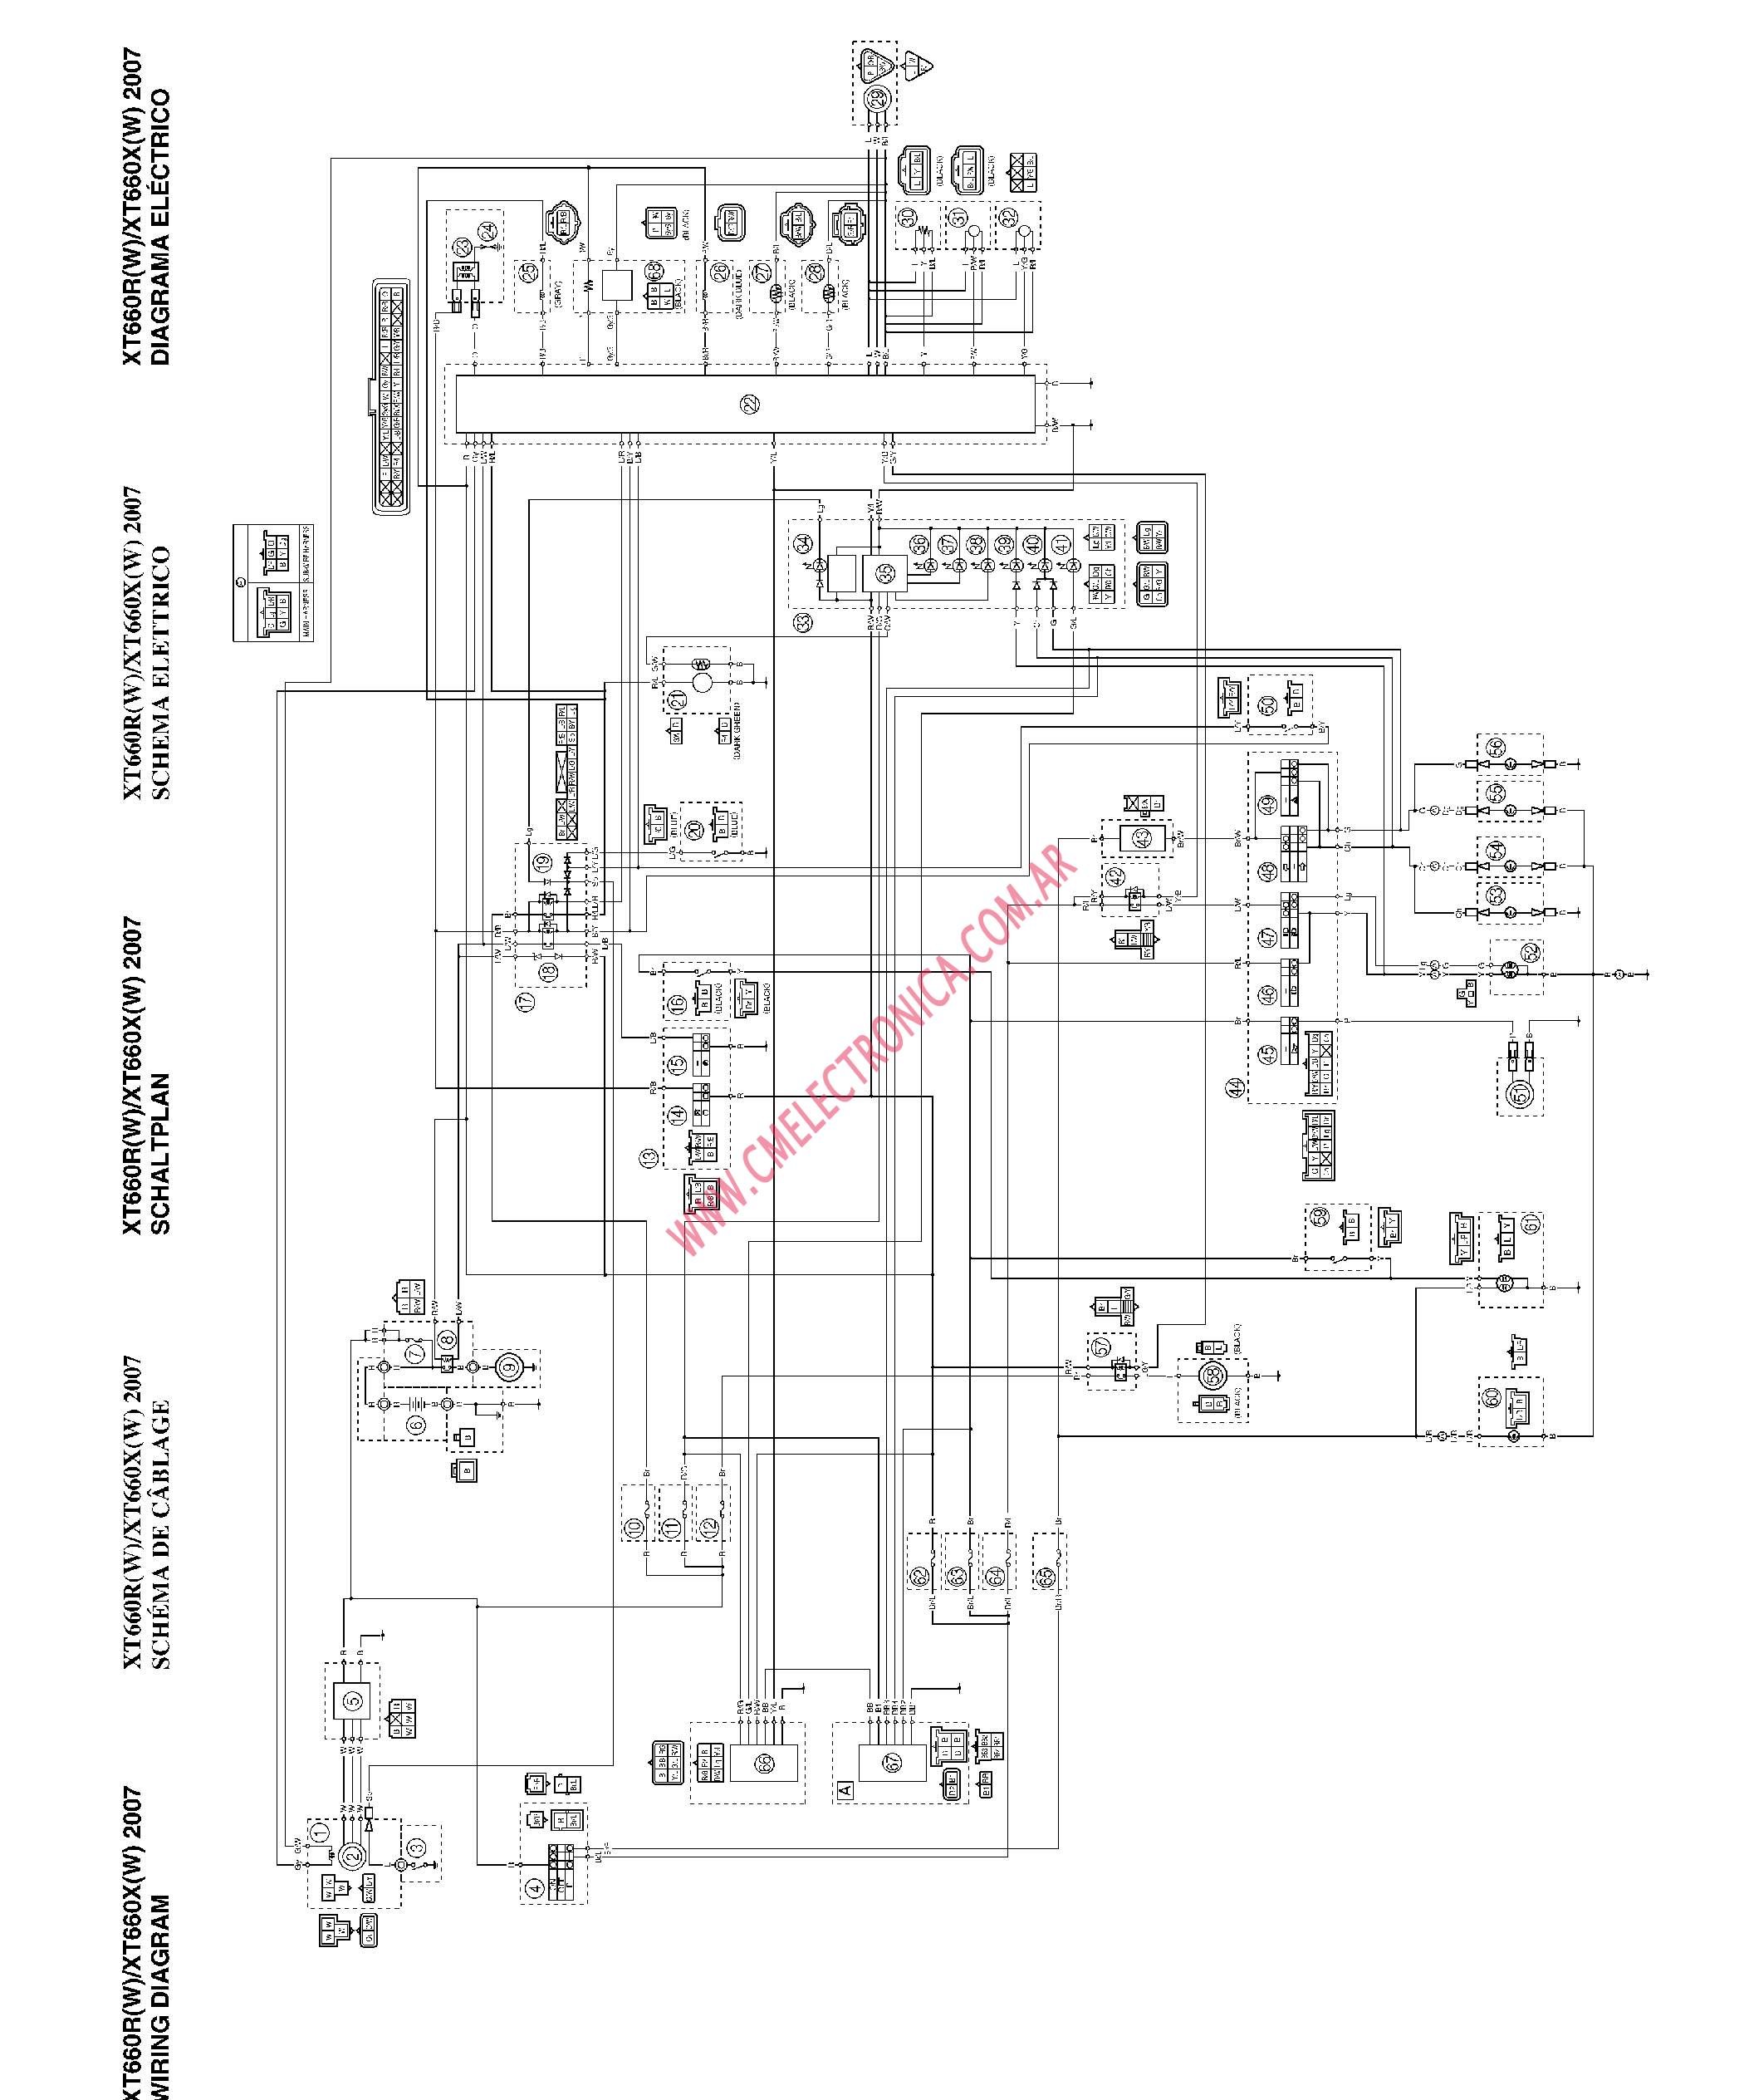 Vbb Wiring Diagram Electrical Diagrams Basic Vespa 12v Wire Schematics Snatch Block